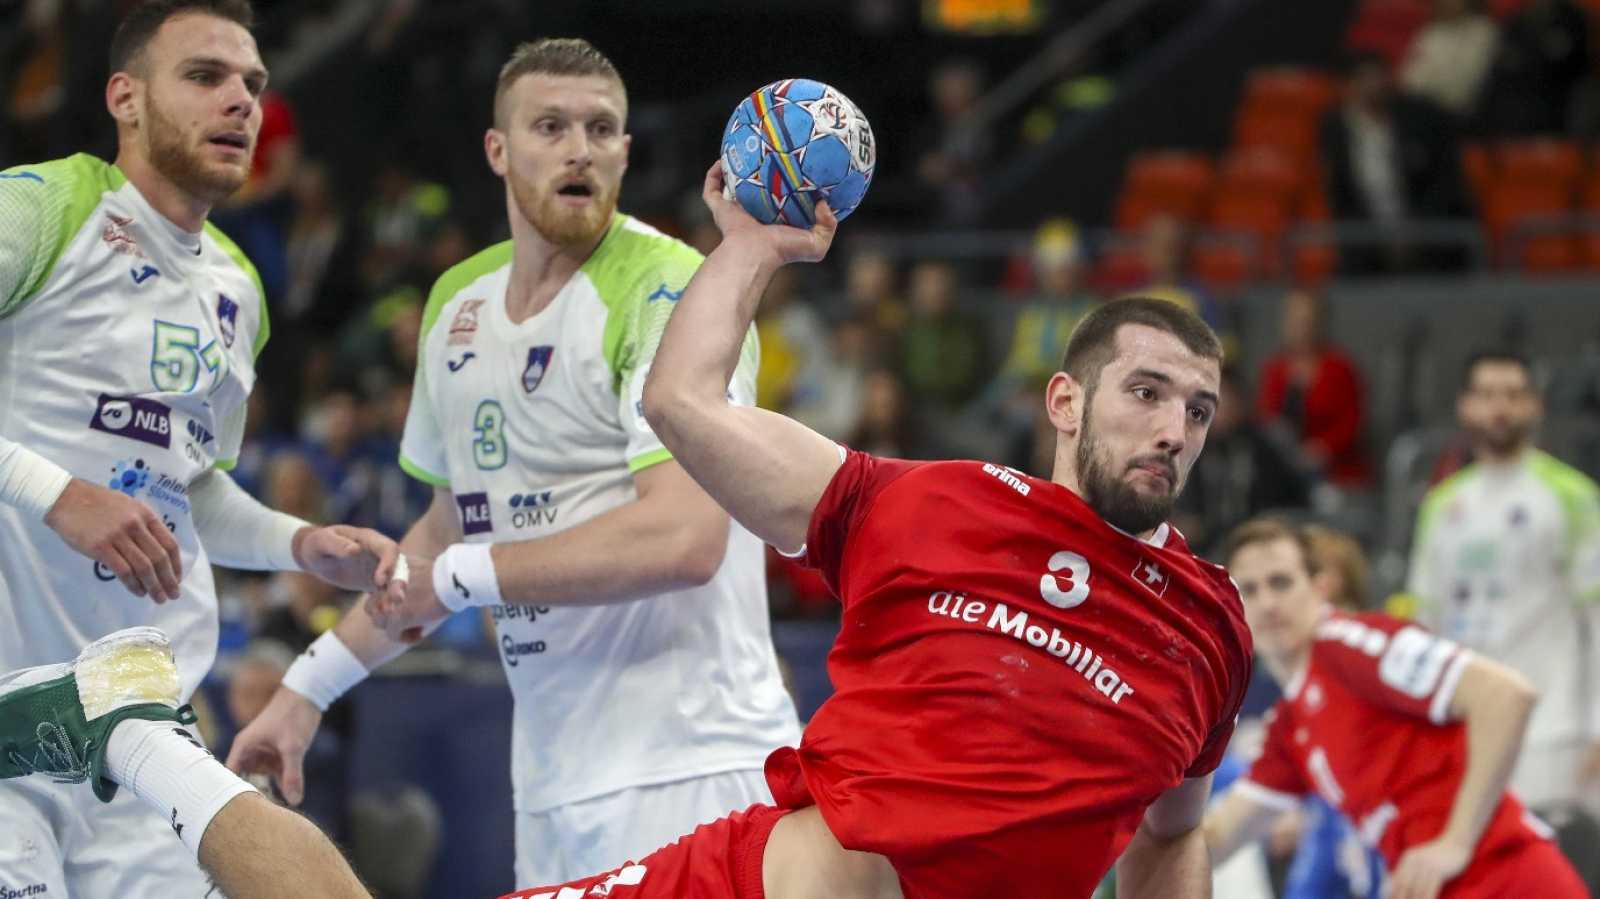 Balonmano - Campeonato de Europa Masculino: Suiza - Eslovenia - ver ahora